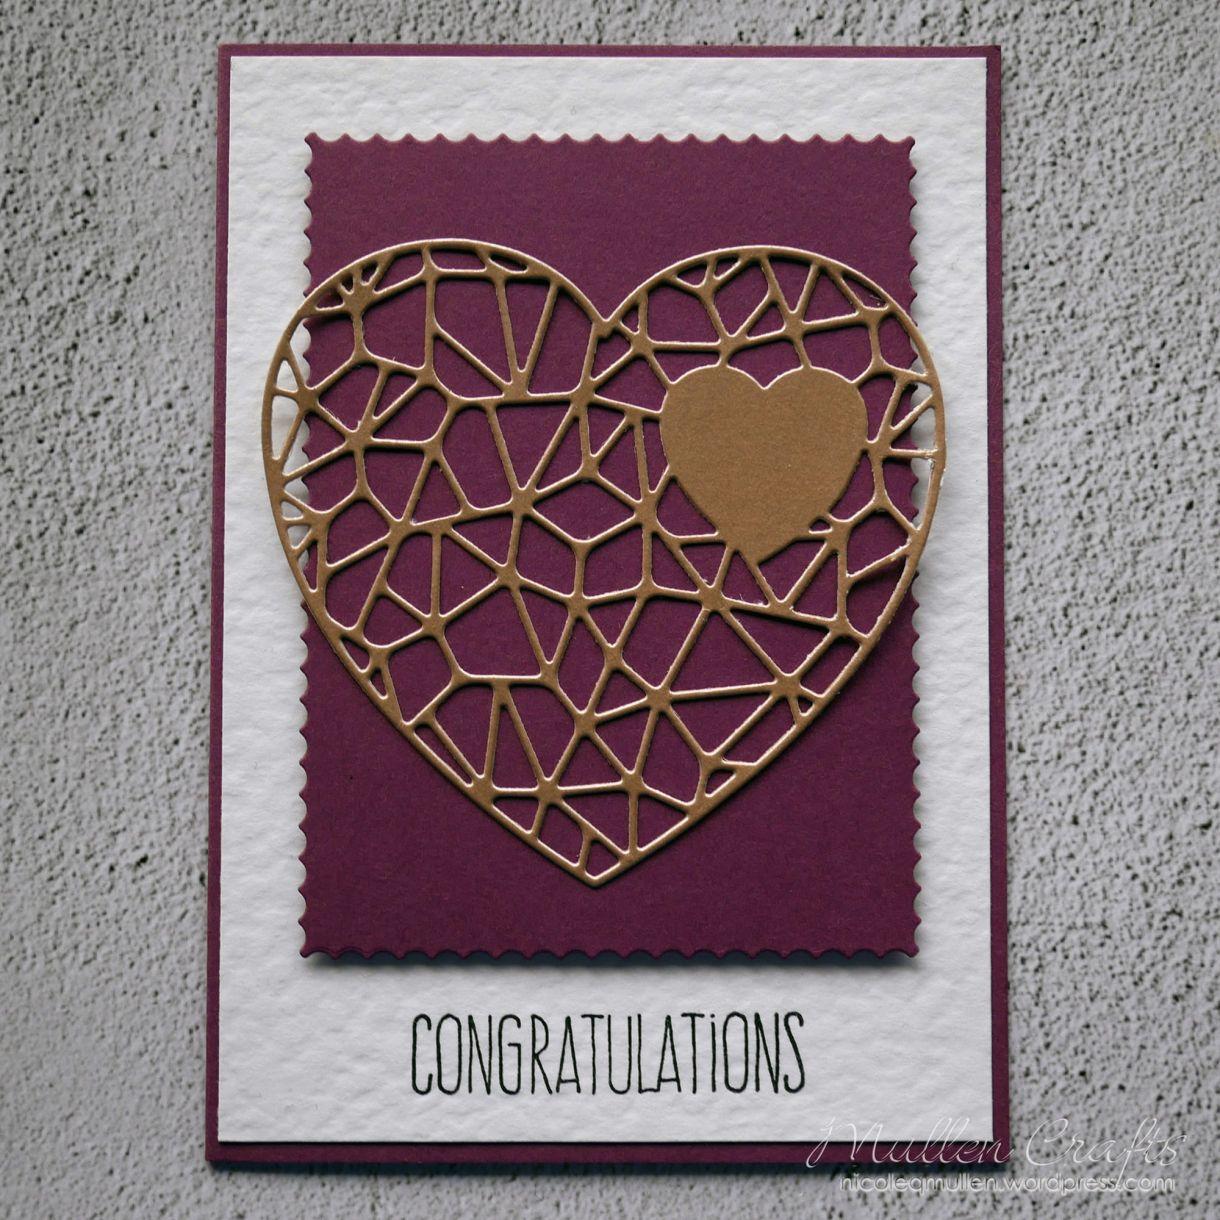 Pirple Heart Congrats 1